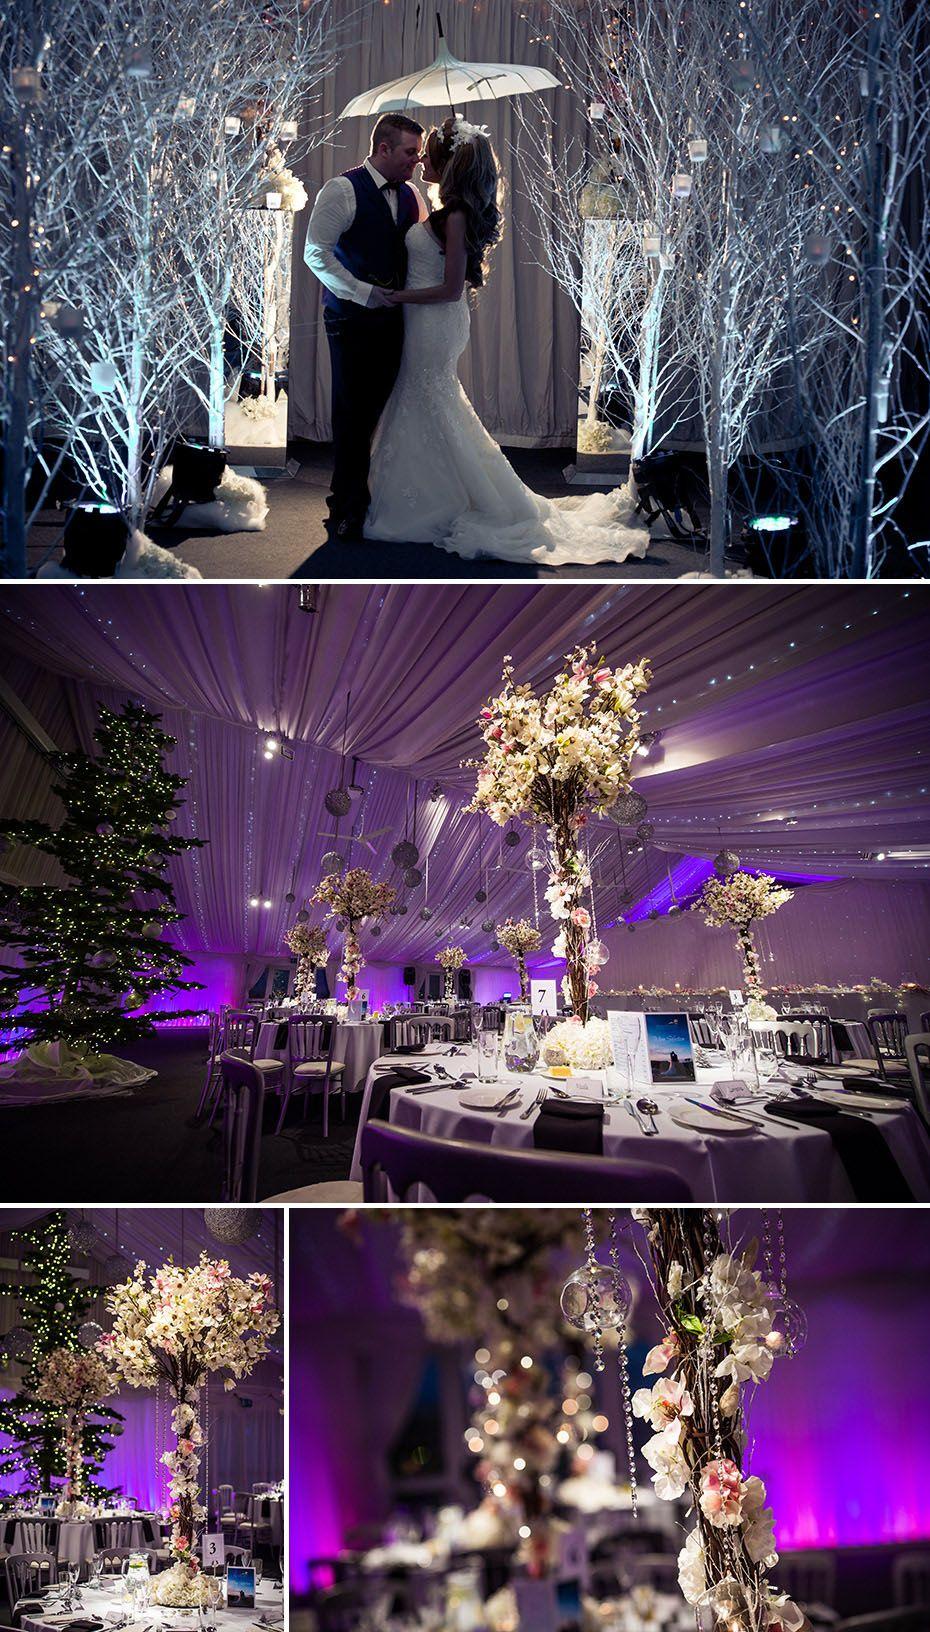 Winter Weddings The Heaton House Farm, Winter, Wonderland Wedding, Purple, Table  Decorations, Wedding Venue, Umbrella, Bride, Wedding Photography